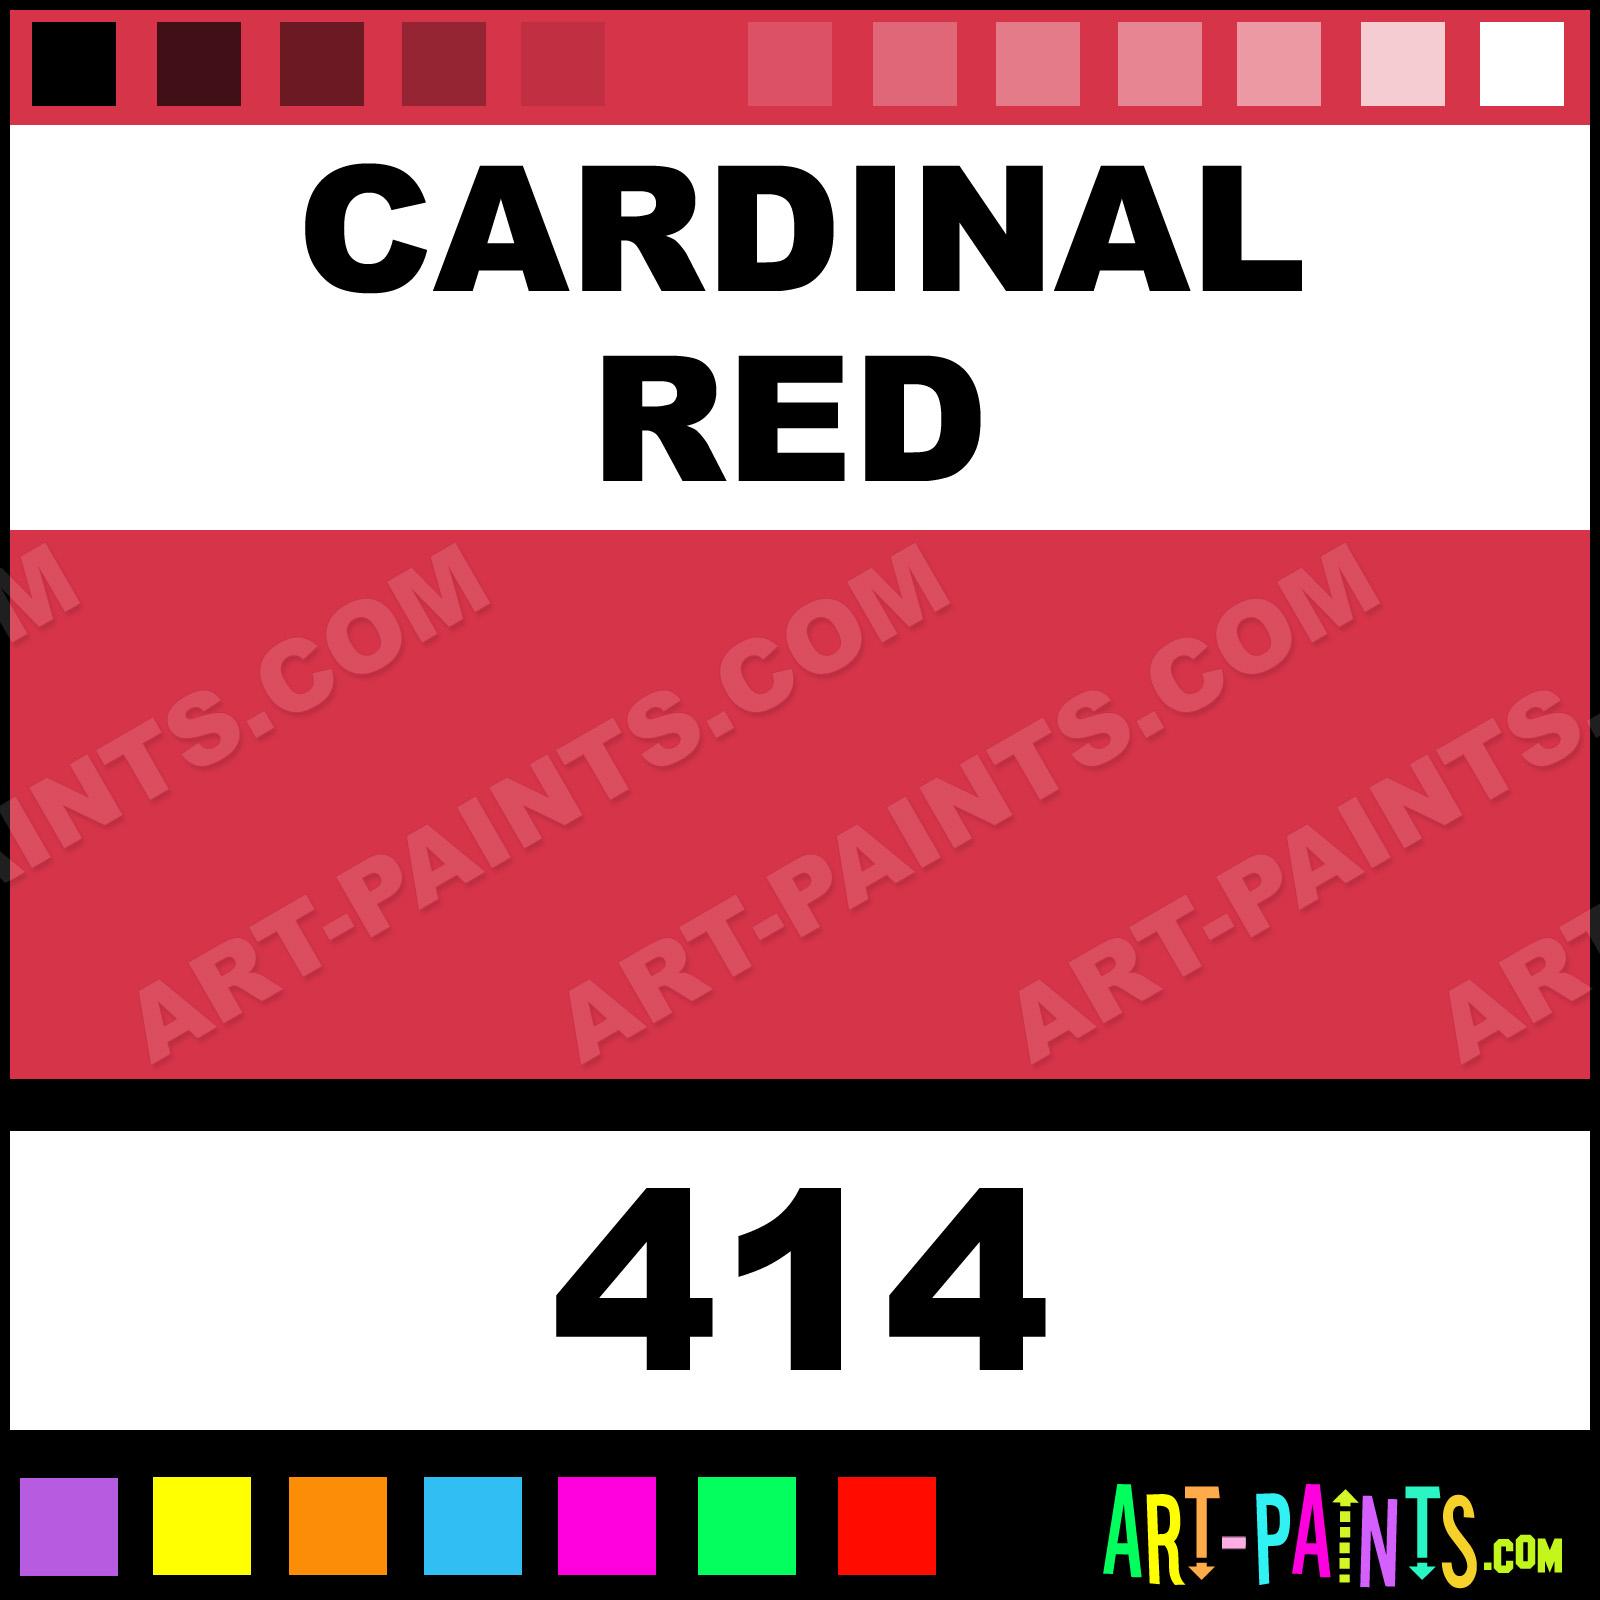 Folk art color chart acrylic paint - Cardinal Red Paint